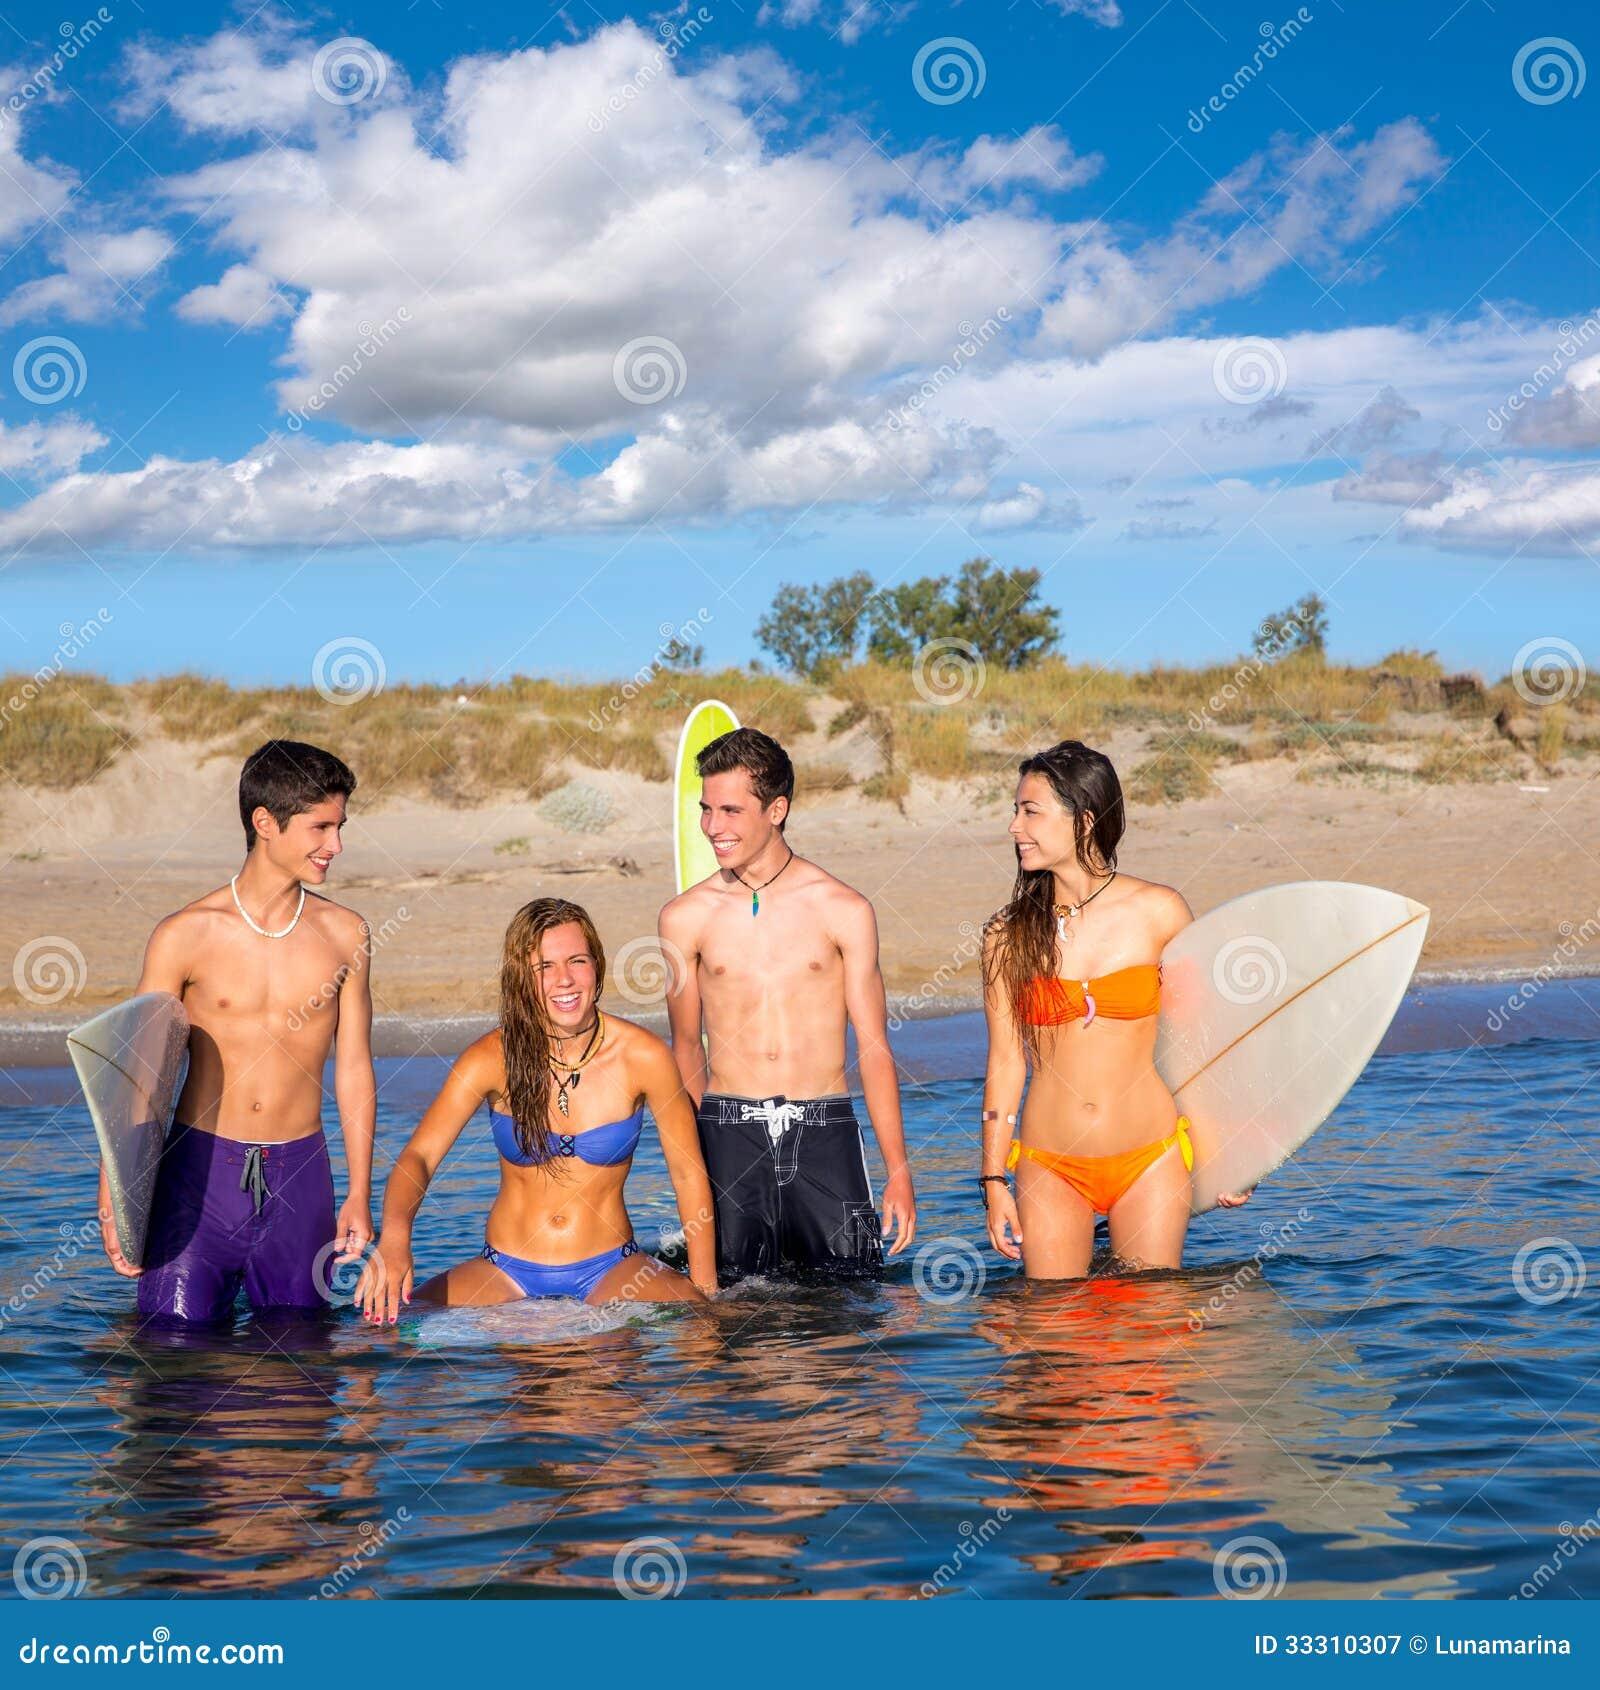 Woman Enjoying At Beach Stock Image Image Of Pleasure: Four Beautiful Young Women Enjoying The Beach Stock Photo